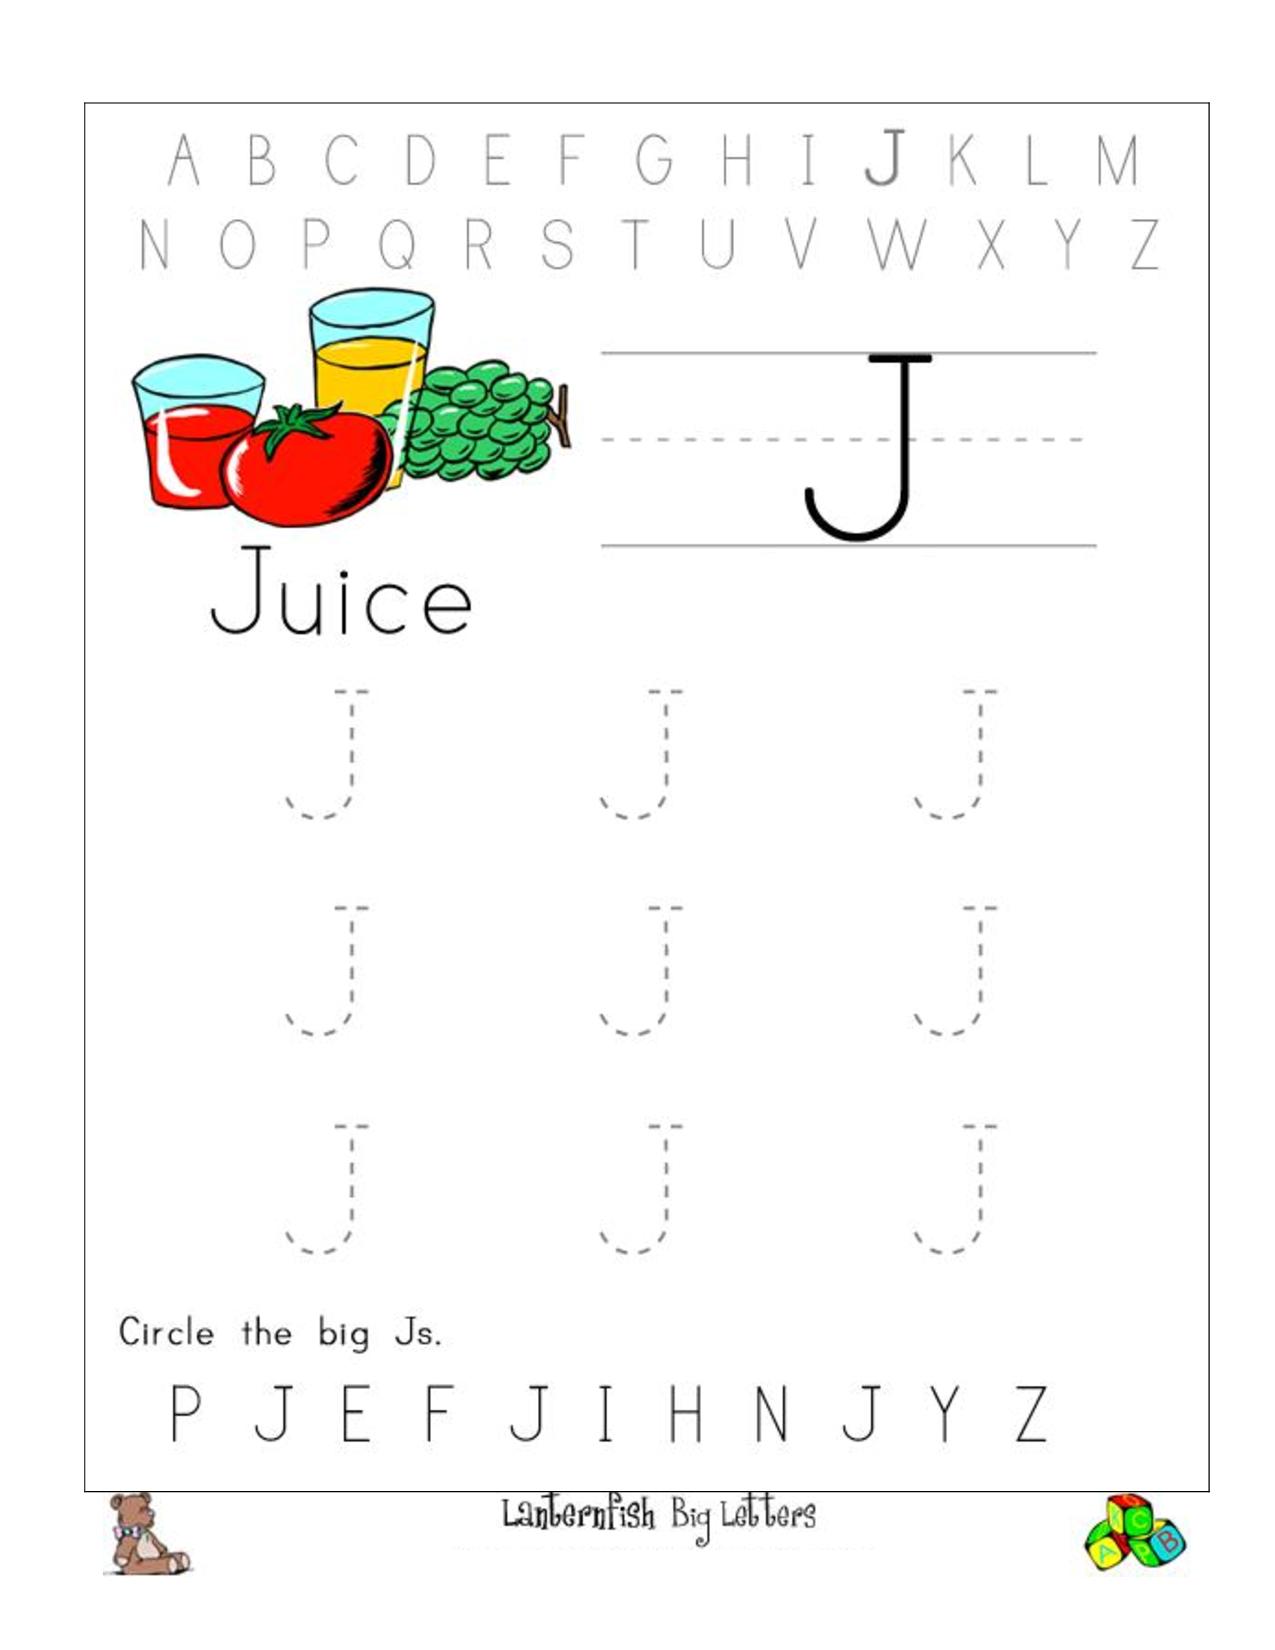 Letter J Worksheets Sb440. Letter J Writing Worksheet Big intended for Letter J Worksheets Sparklebox